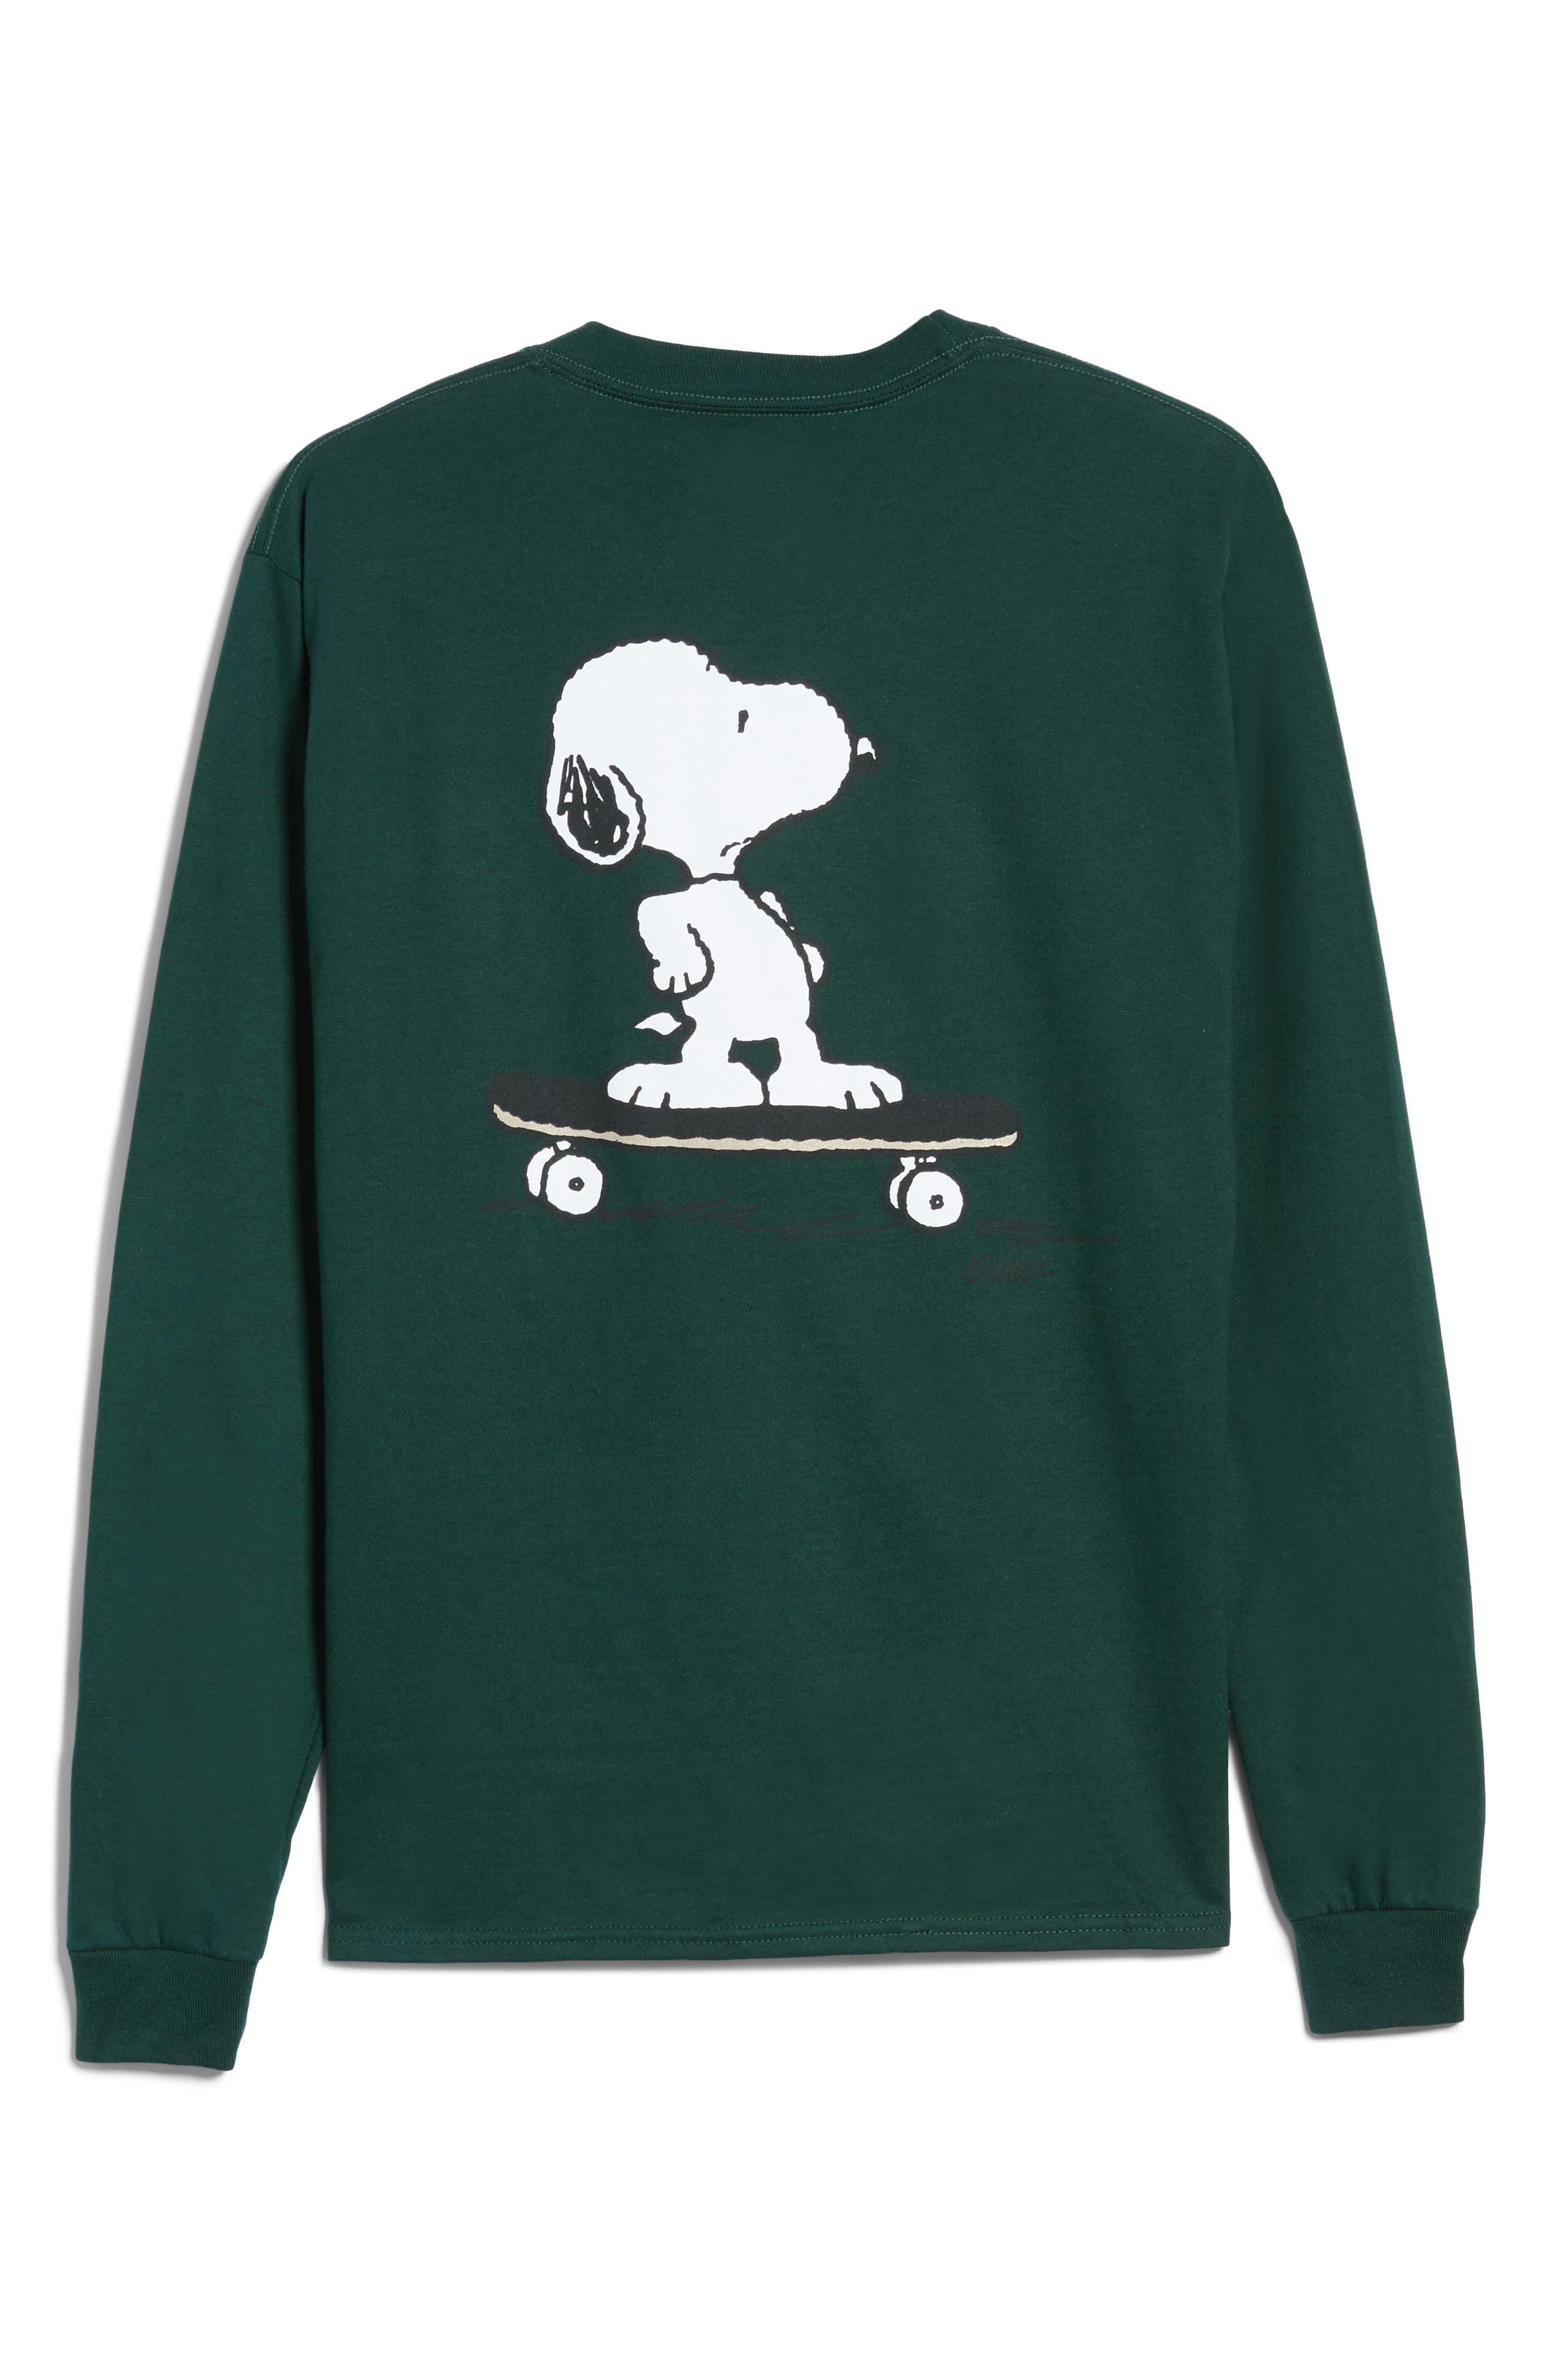 Main Image - Peanuts Snoopy Skate Long Sleeve T-Shirt